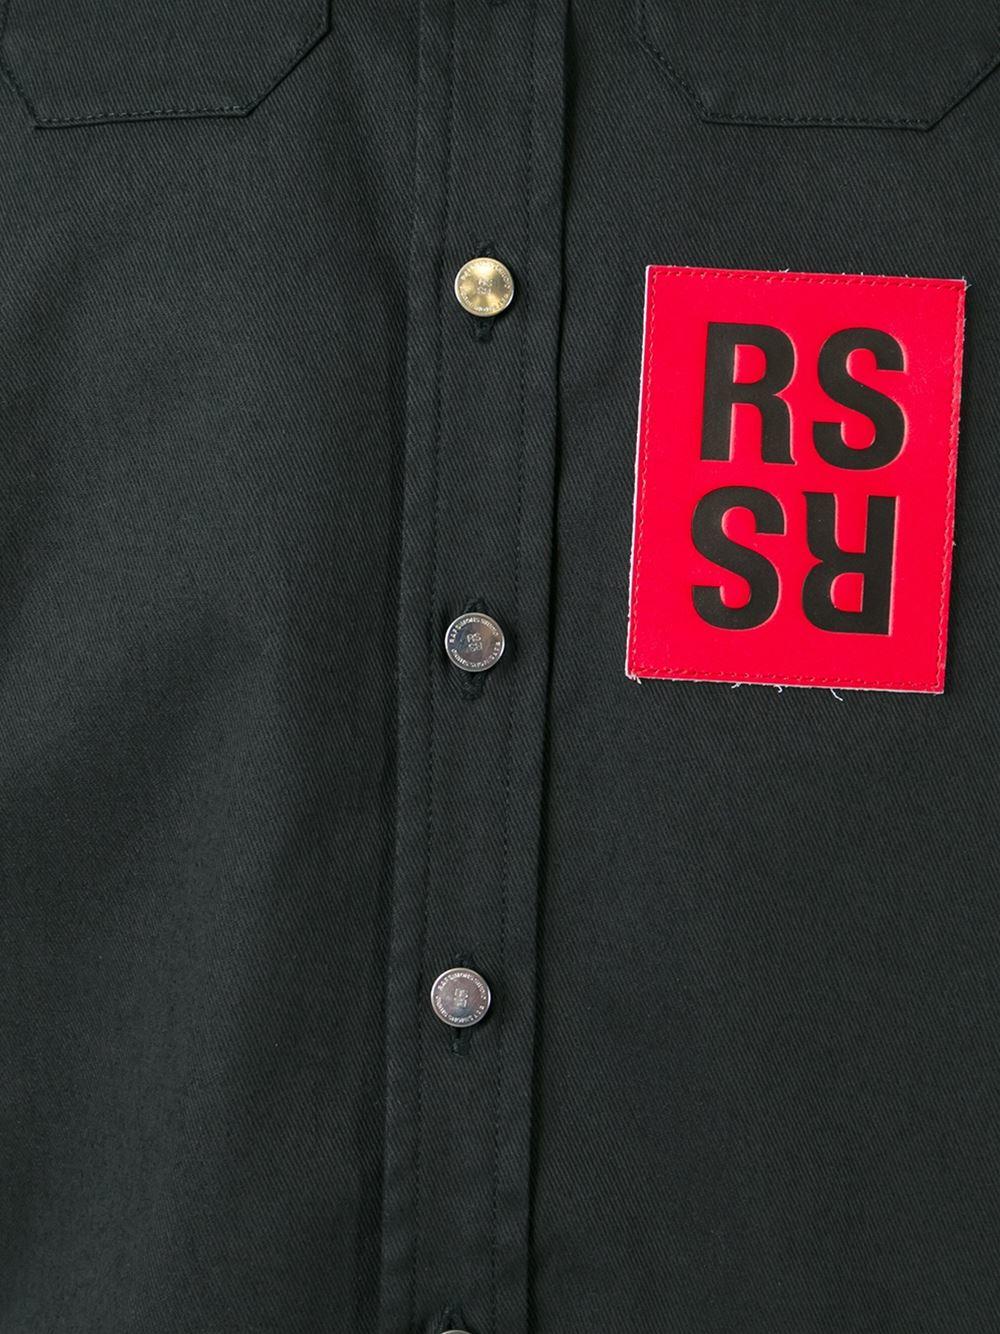 a703c48fe9 Raf simons Logo Patch Shirt in Black for Men